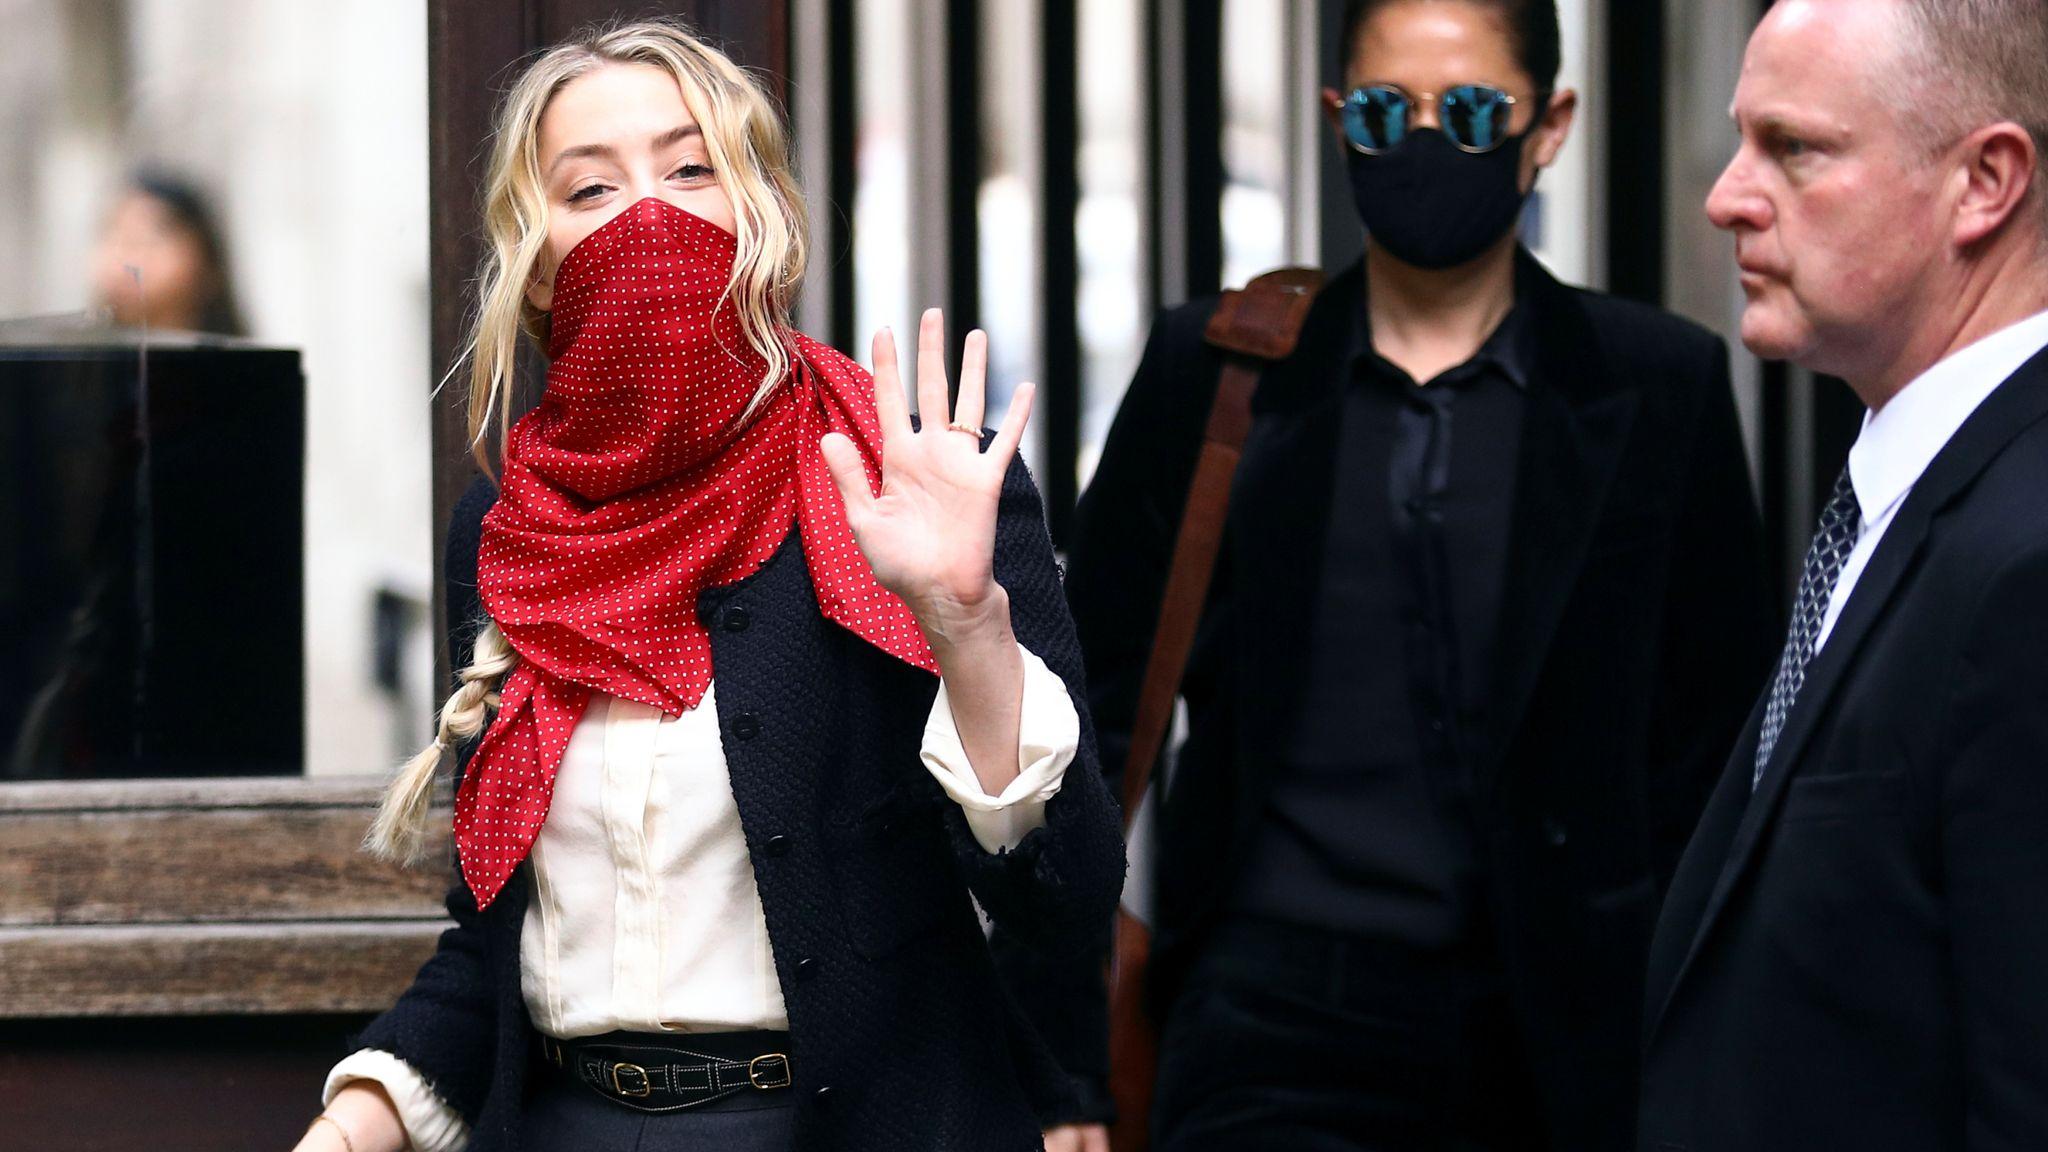 Amber Heard arrives on 17 July